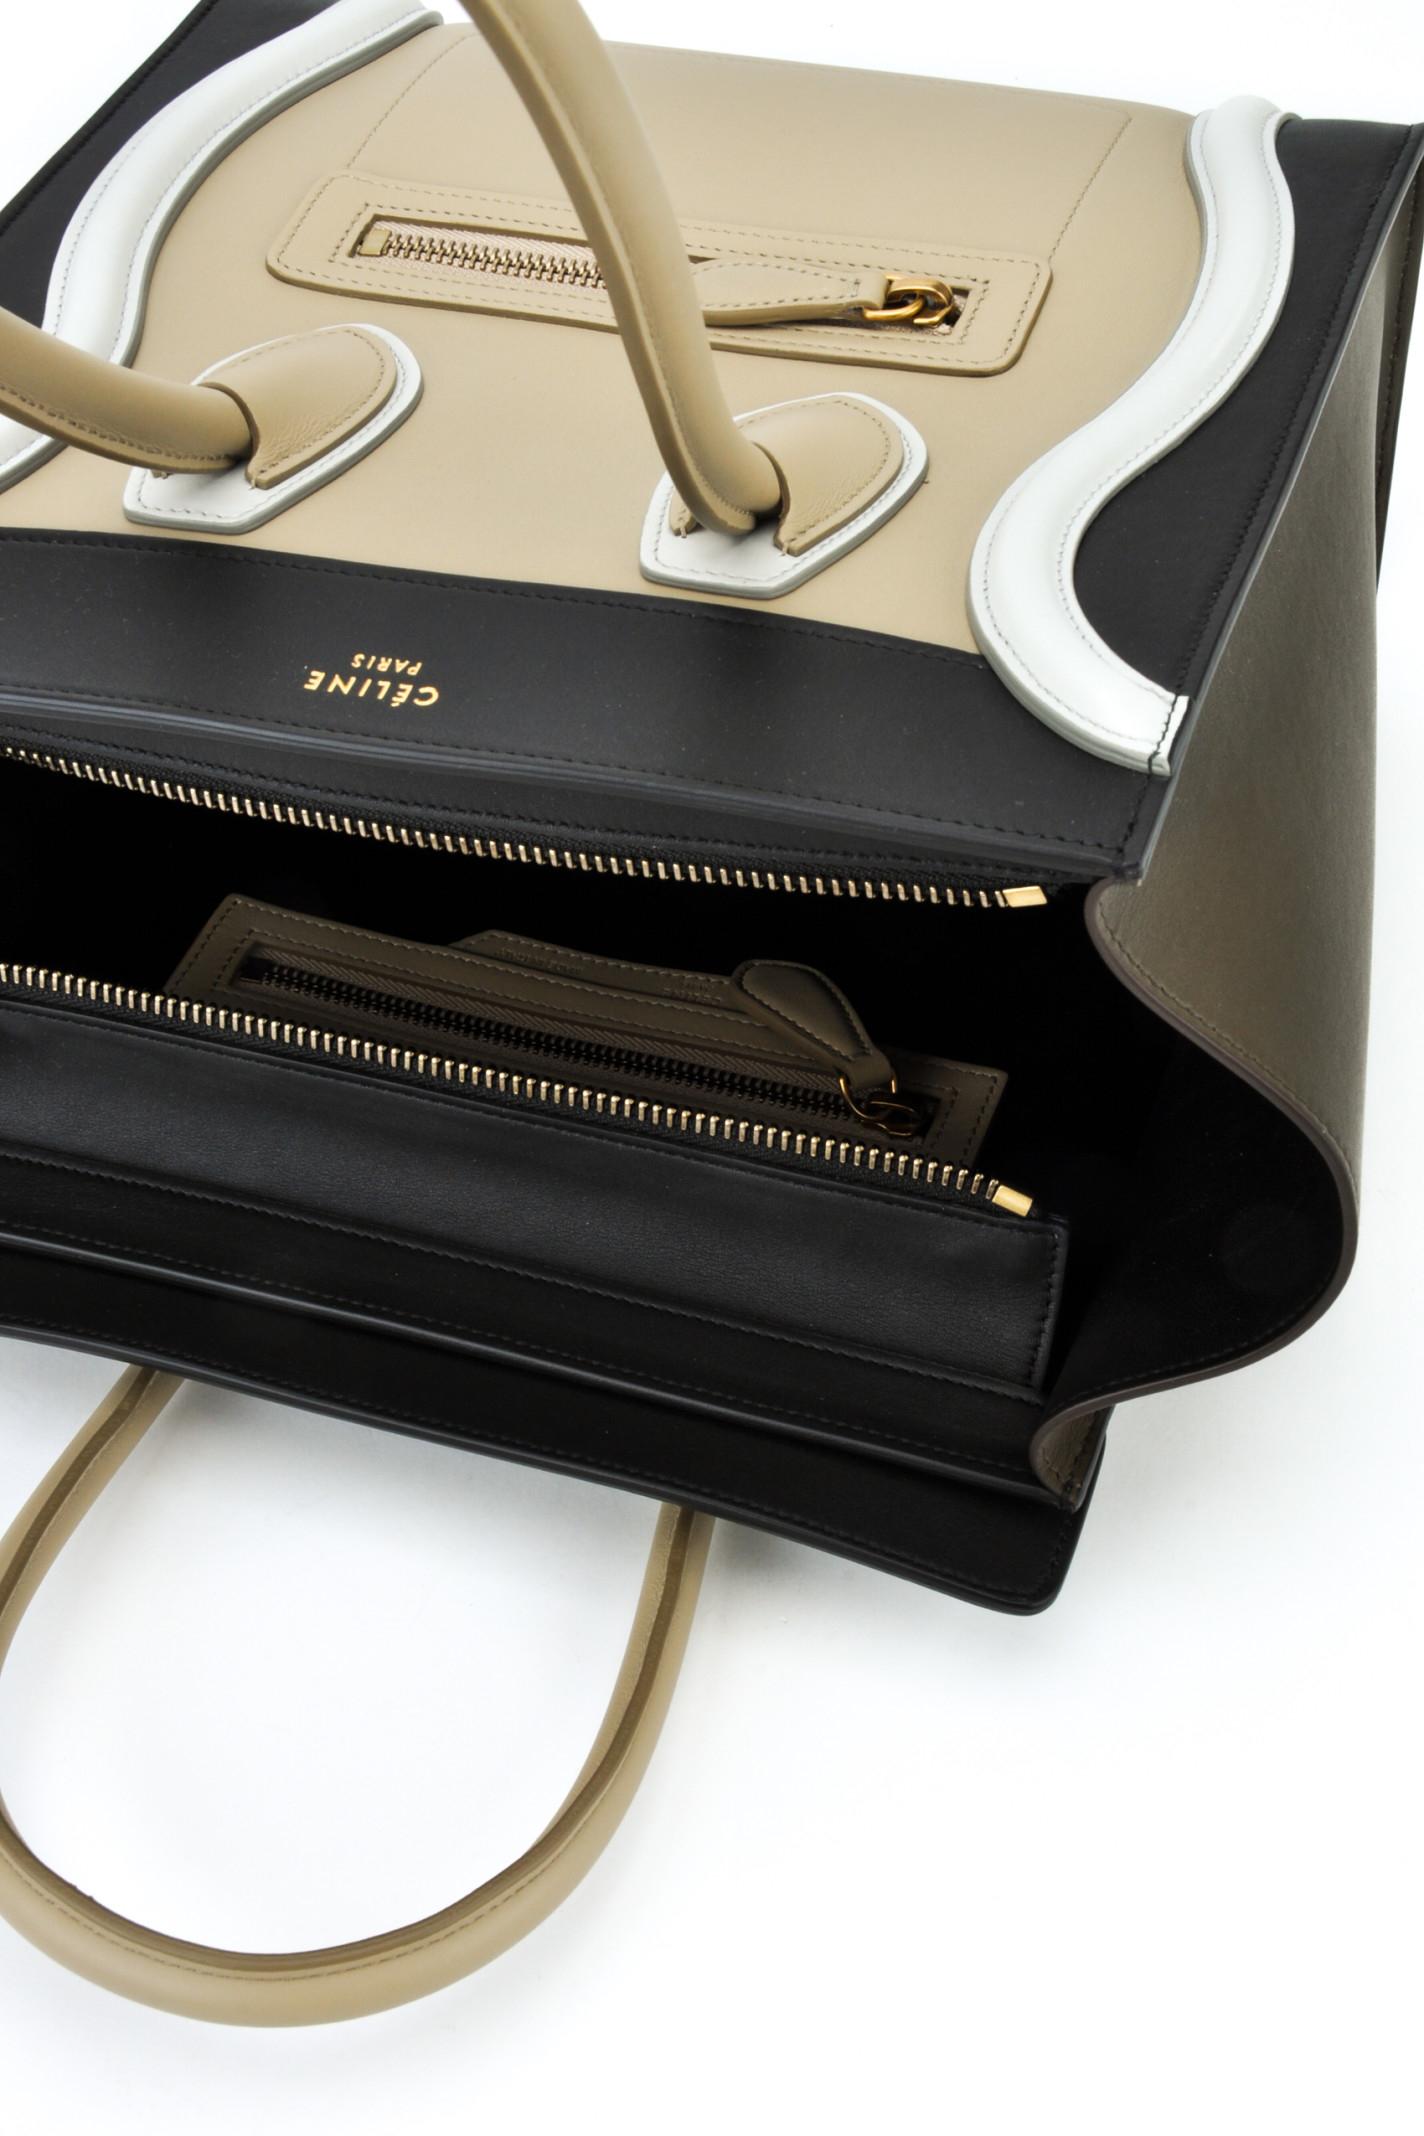 C¨¦line Borsa Micro Luggage in Beige | Lyst